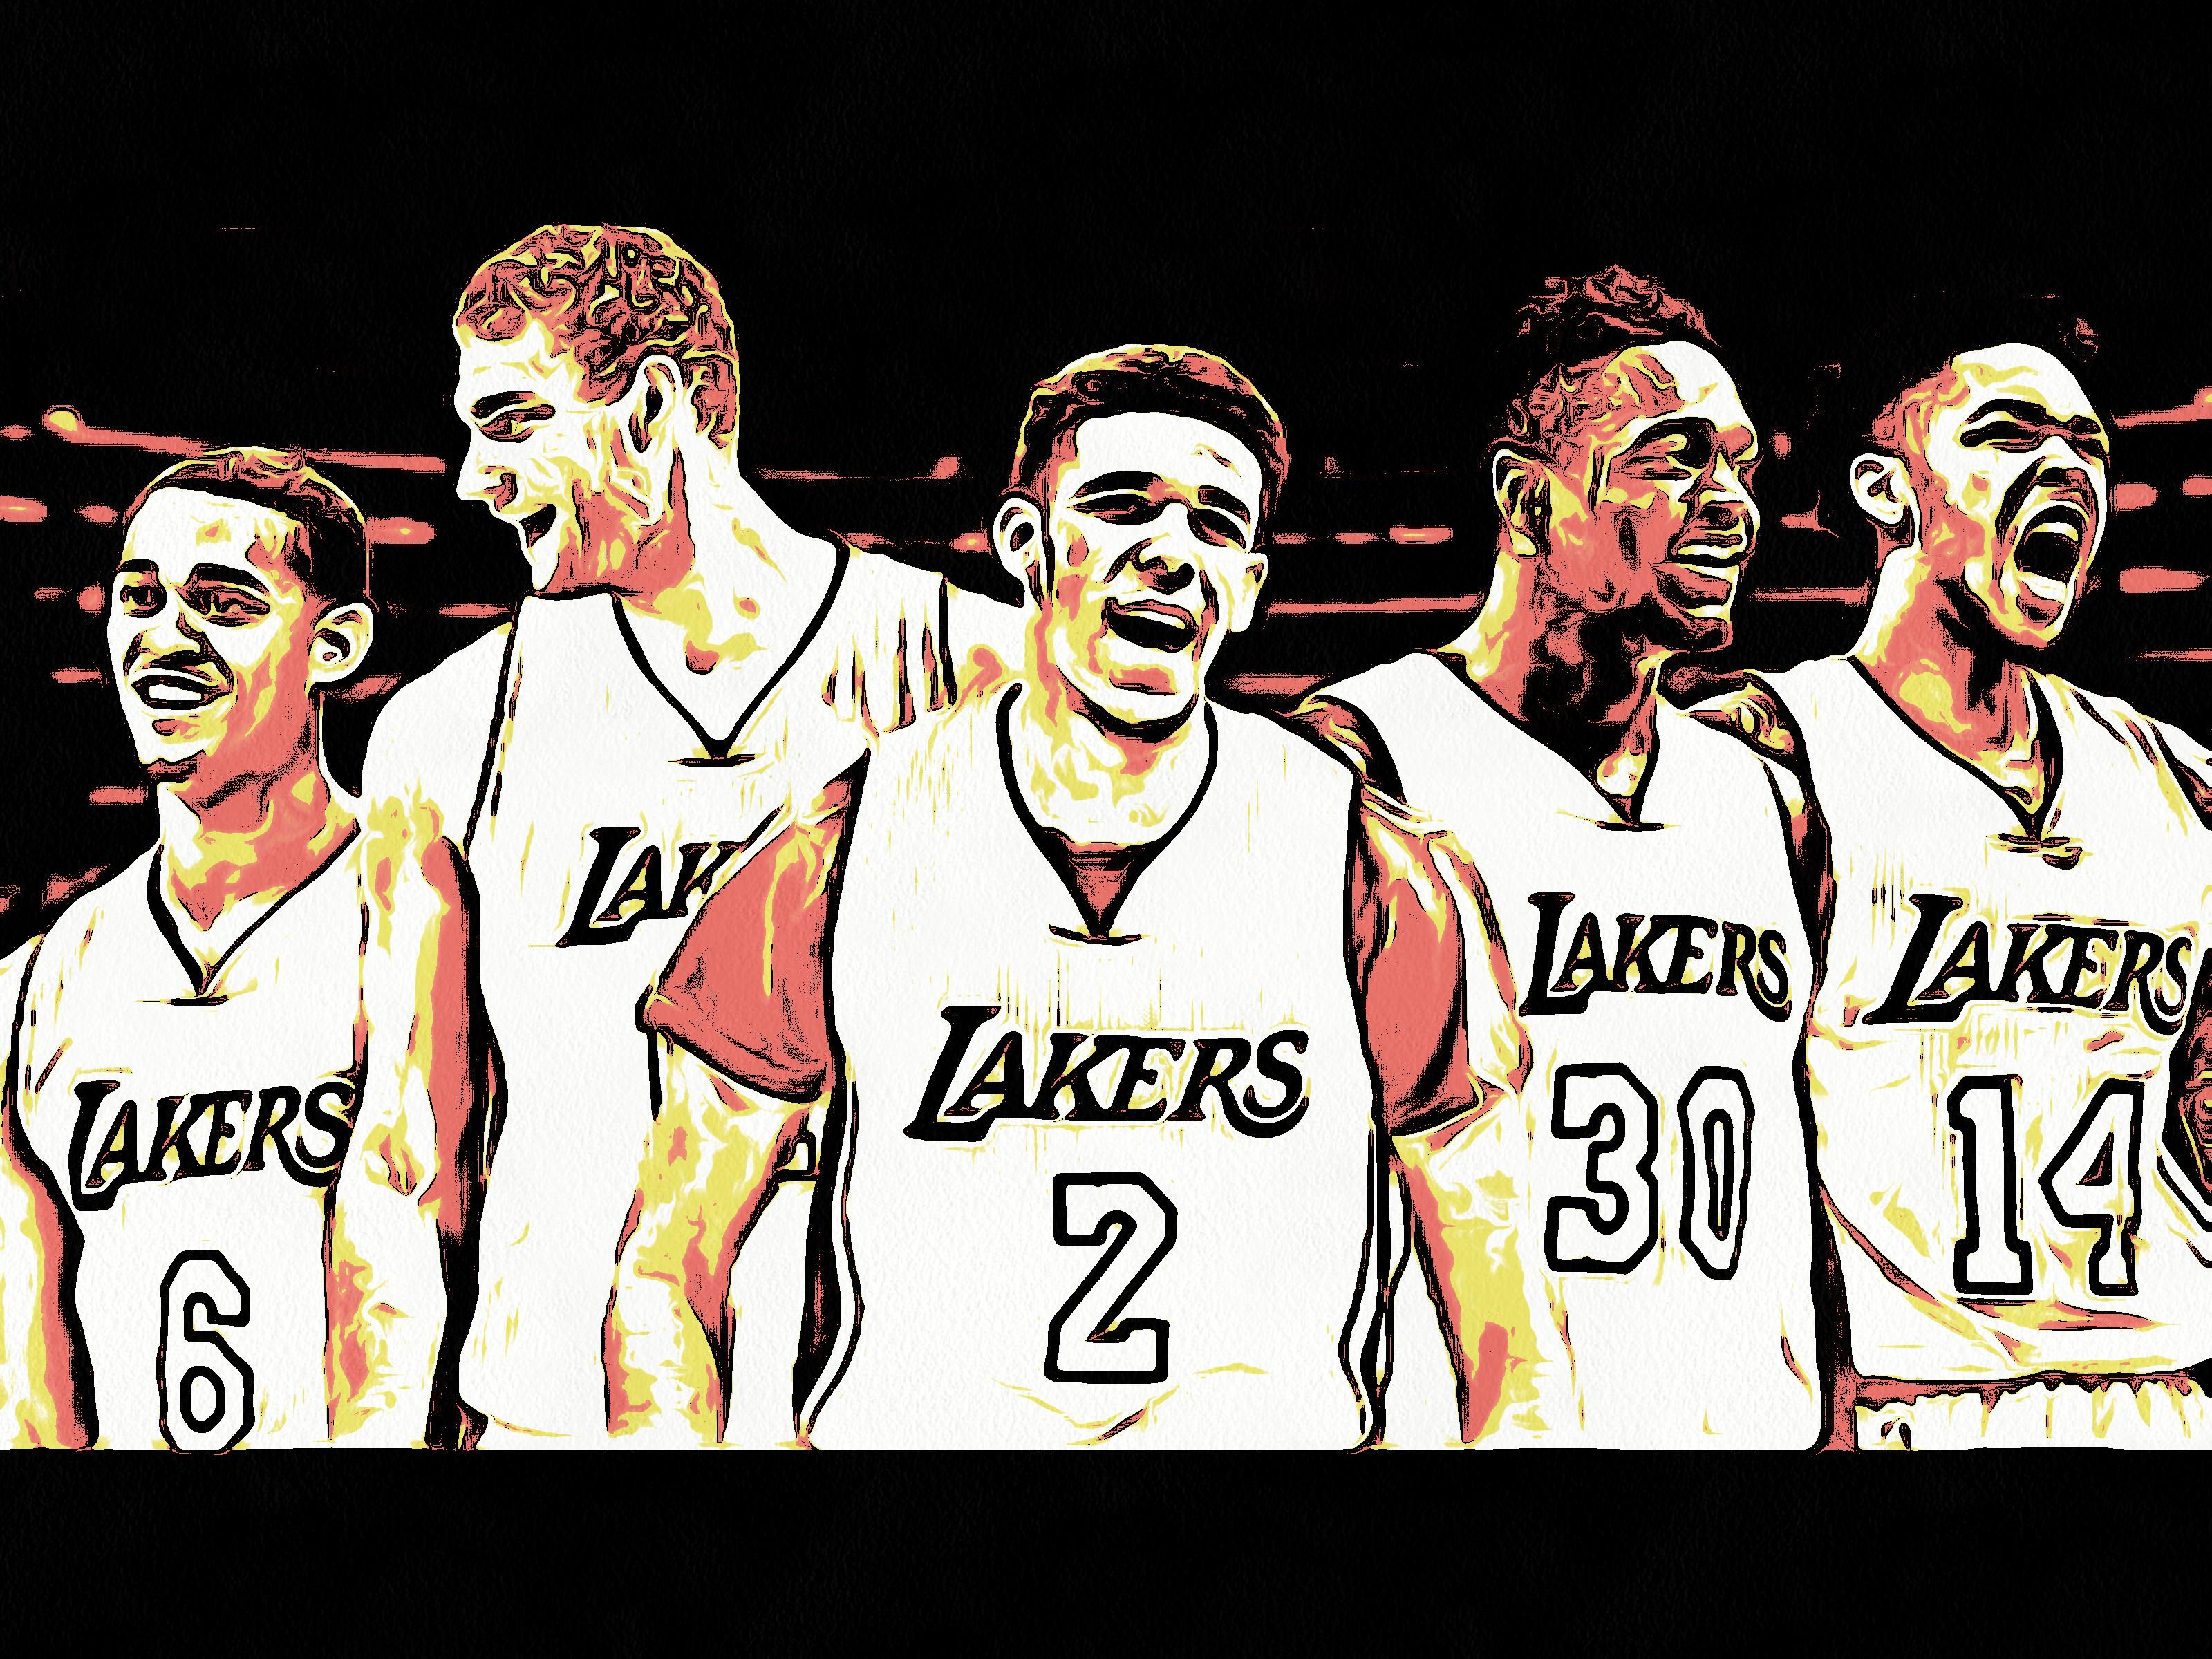 Lonzo's Lakers - a new era has begun